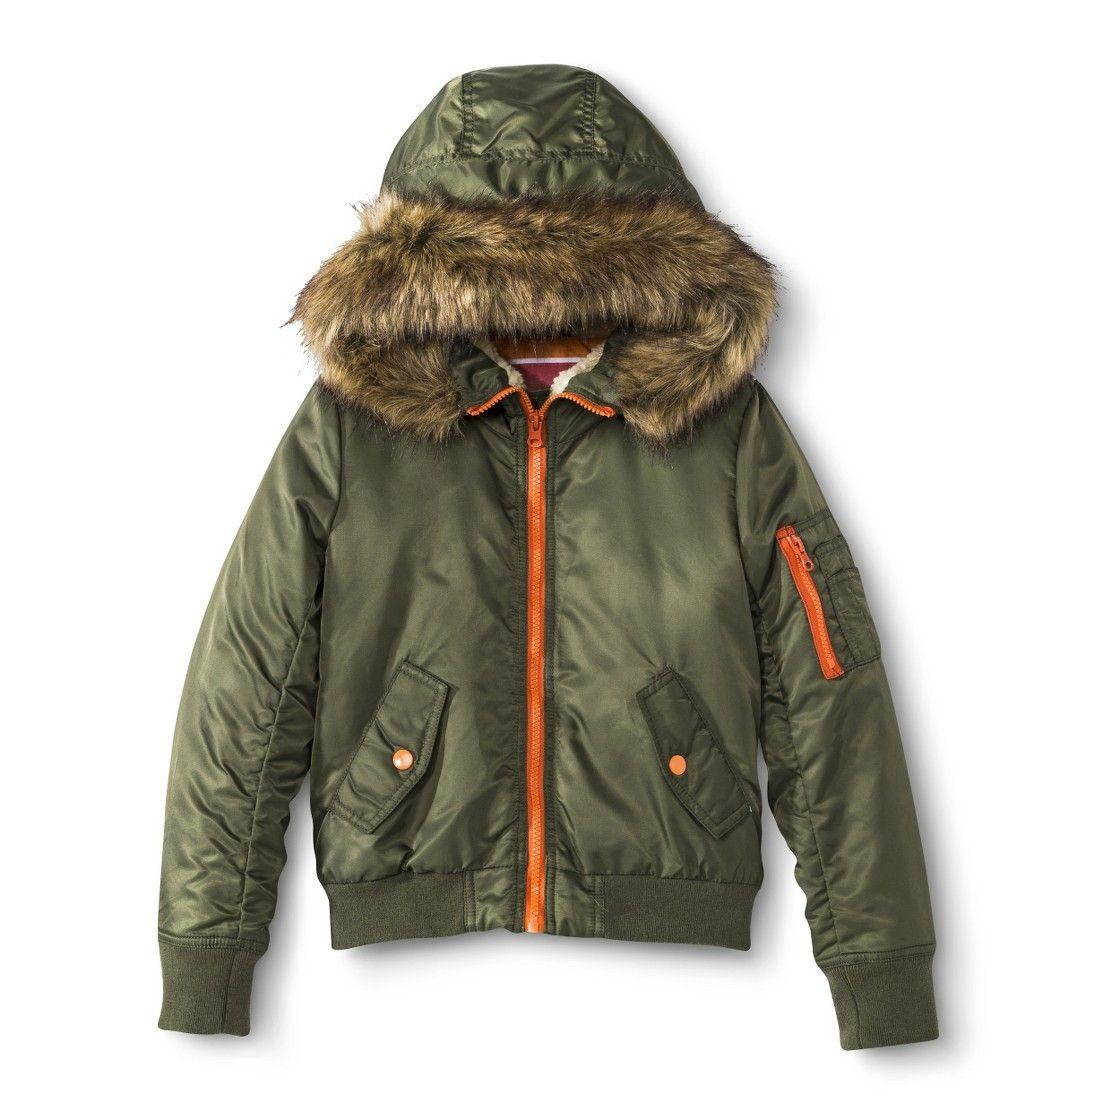 tripletap to zoom in Girls bomber jacket, Bomber jacket